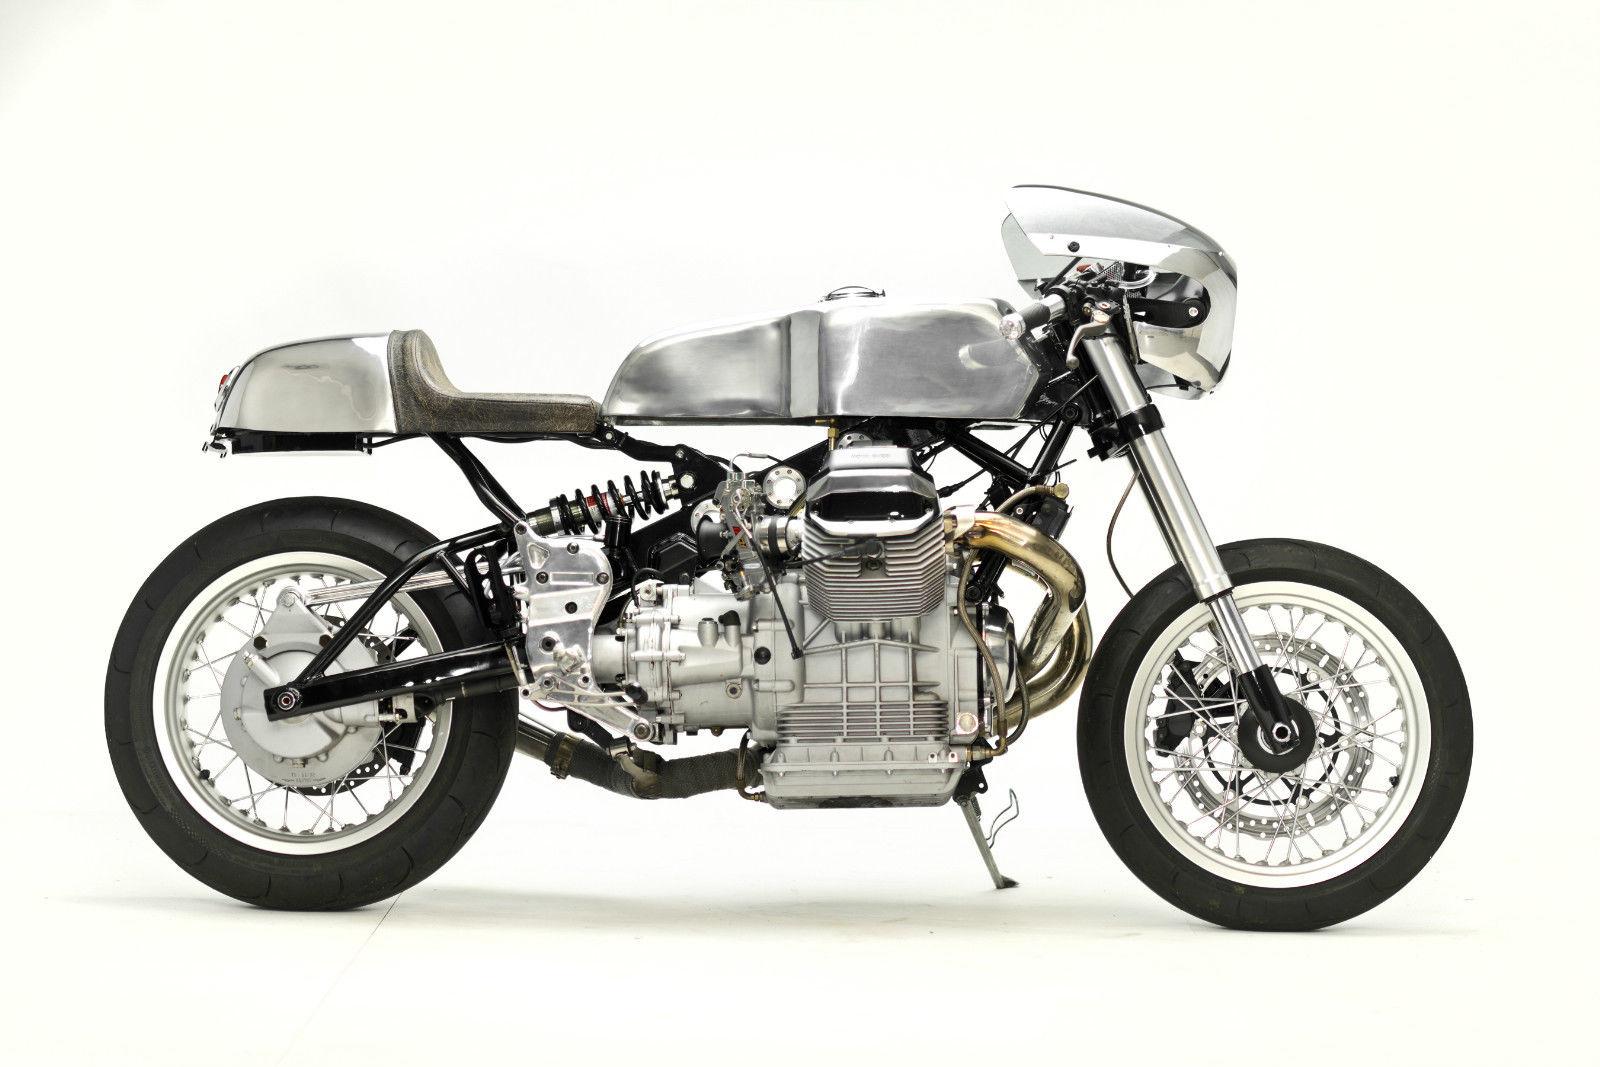 2000 moto guzzi v11 sport custom bike urious. Black Bedroom Furniture Sets. Home Design Ideas